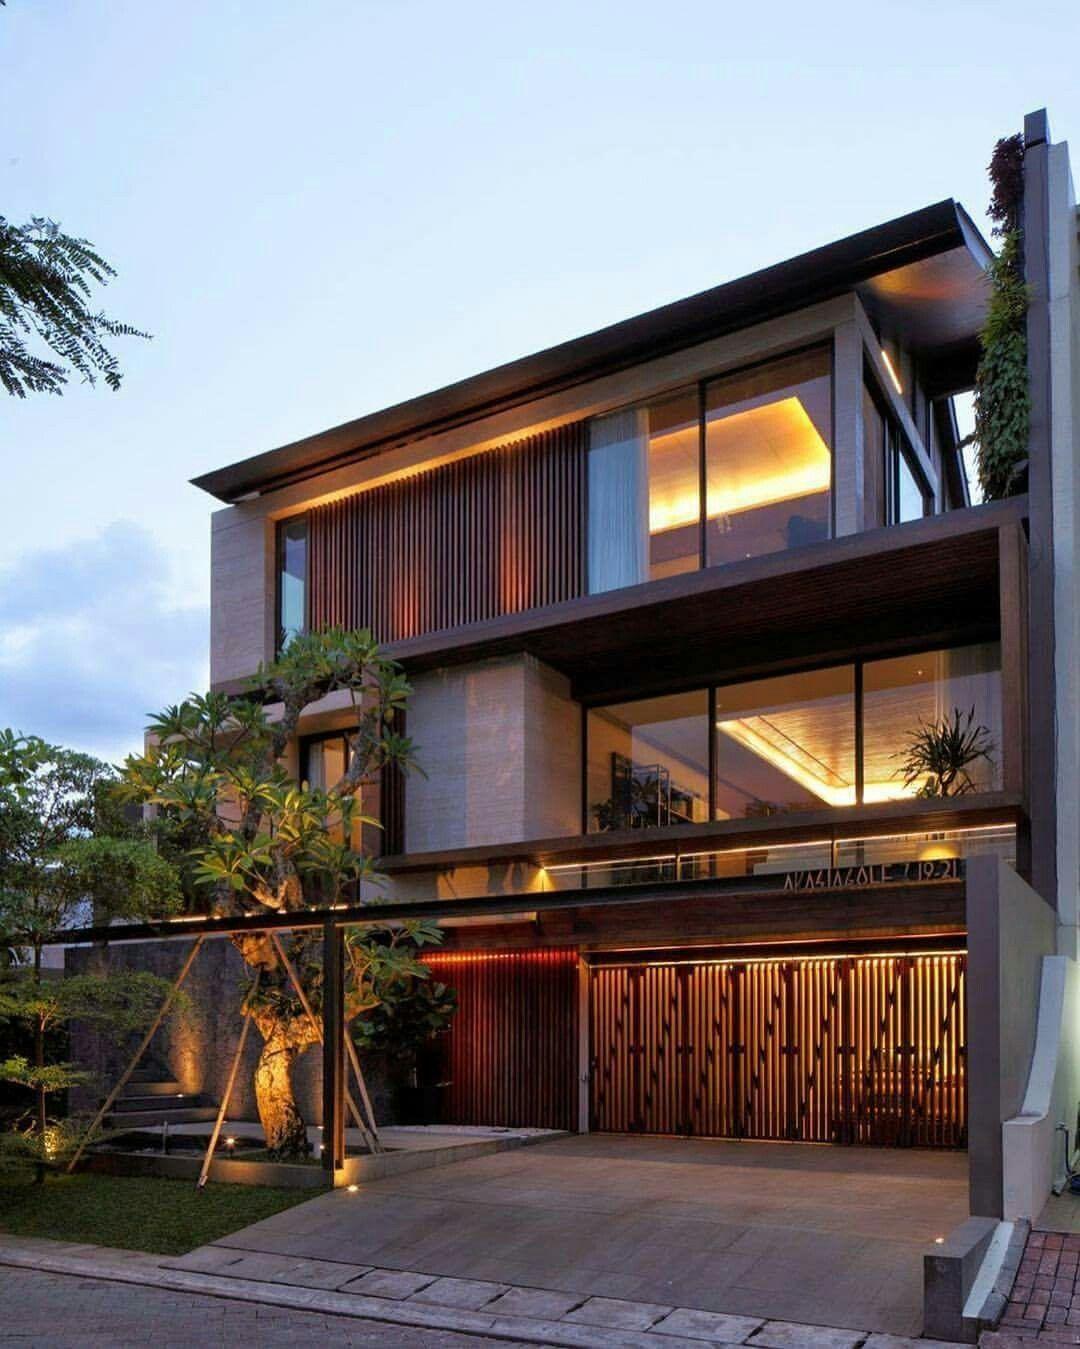 House design indonesia - Jakarta House By Nataneka Architects In Jakarta Indonesia